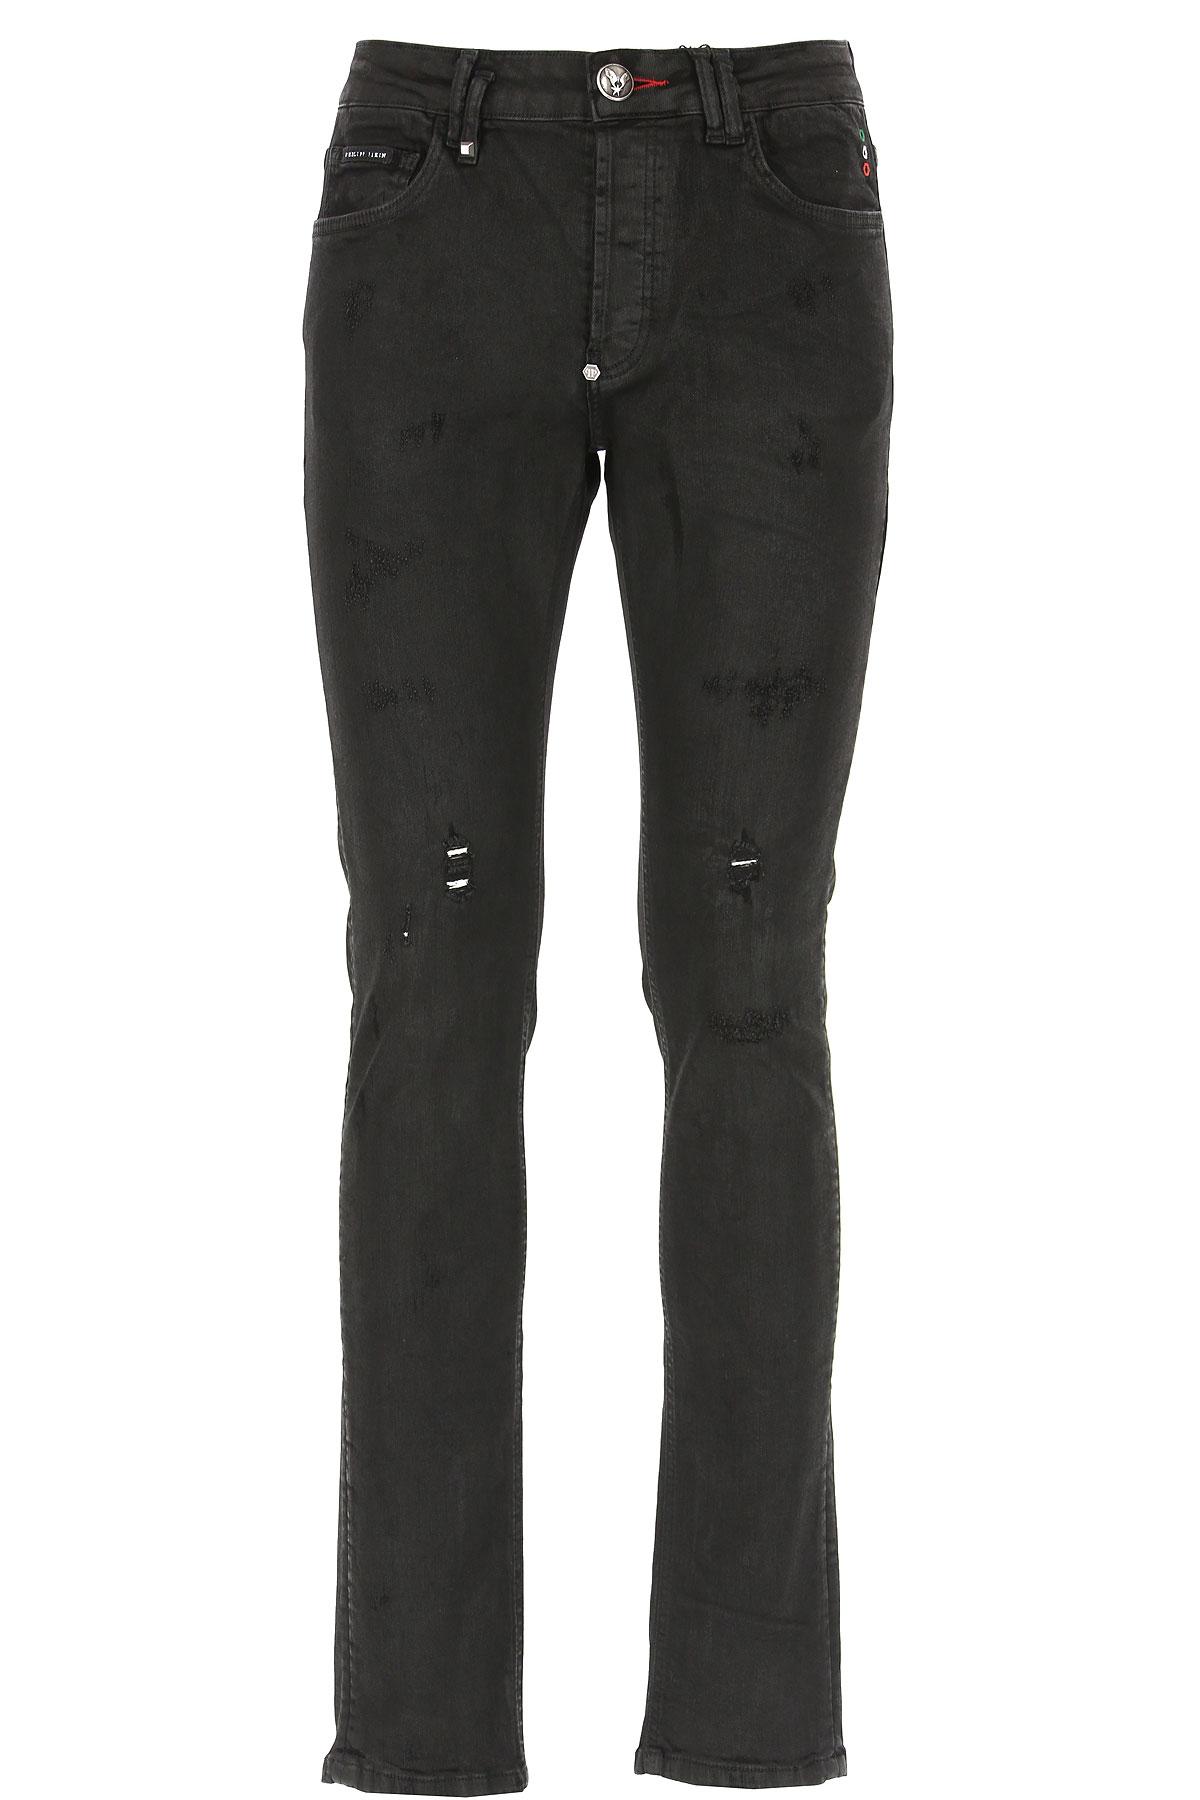 Philipp Plein Jeans On Sale, Black, Cotton, 2019, 31 32 33